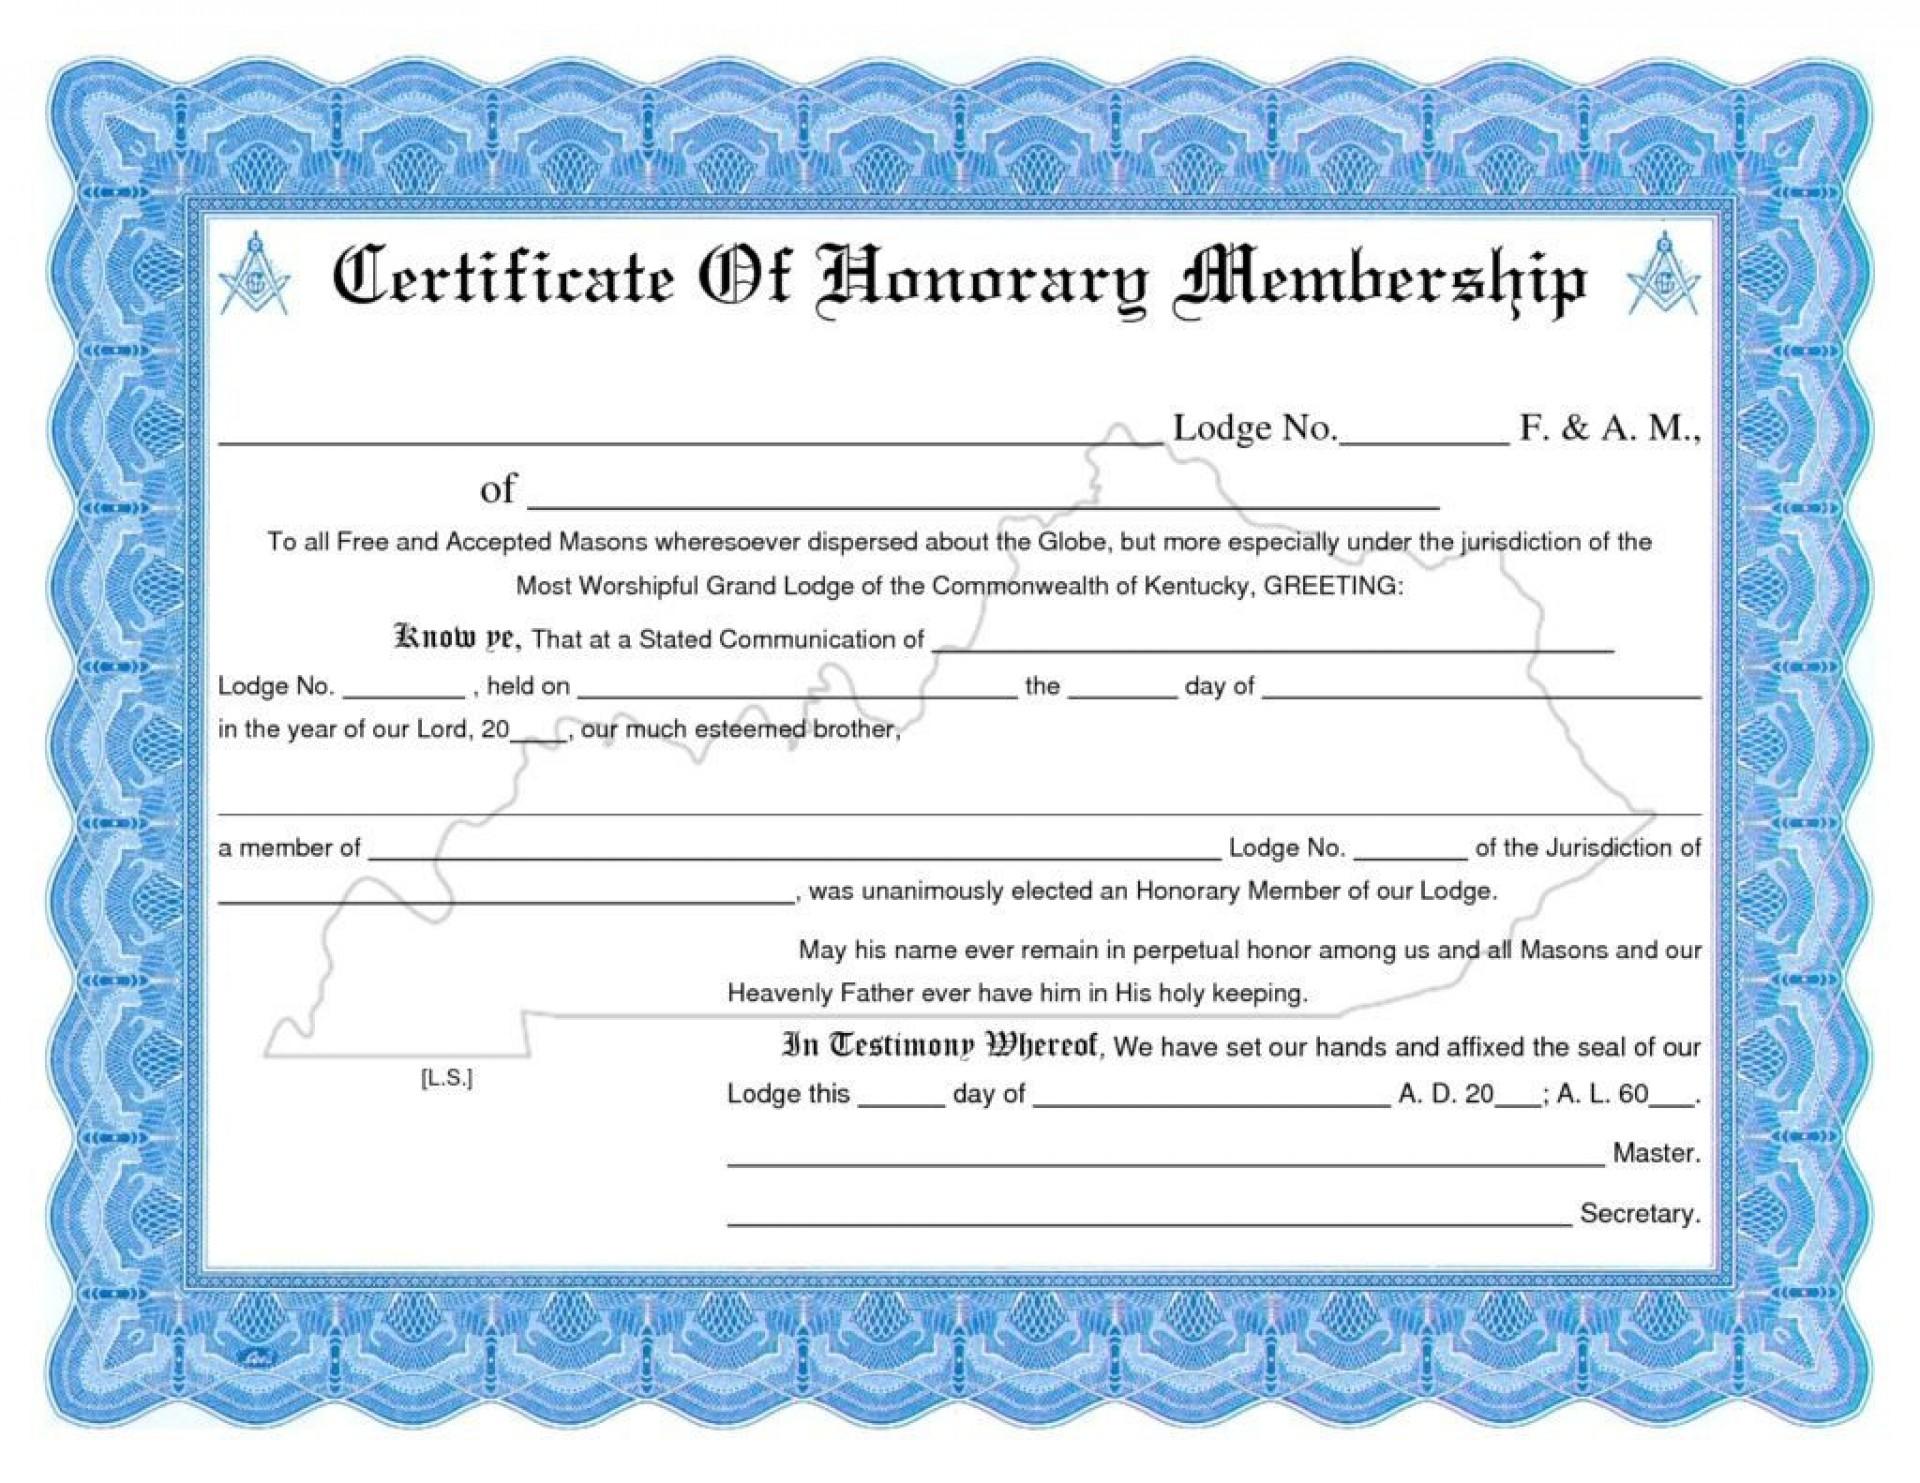 002 Unique Llc Membership Certificate Template Highest Clarity  Interest Free Member1920